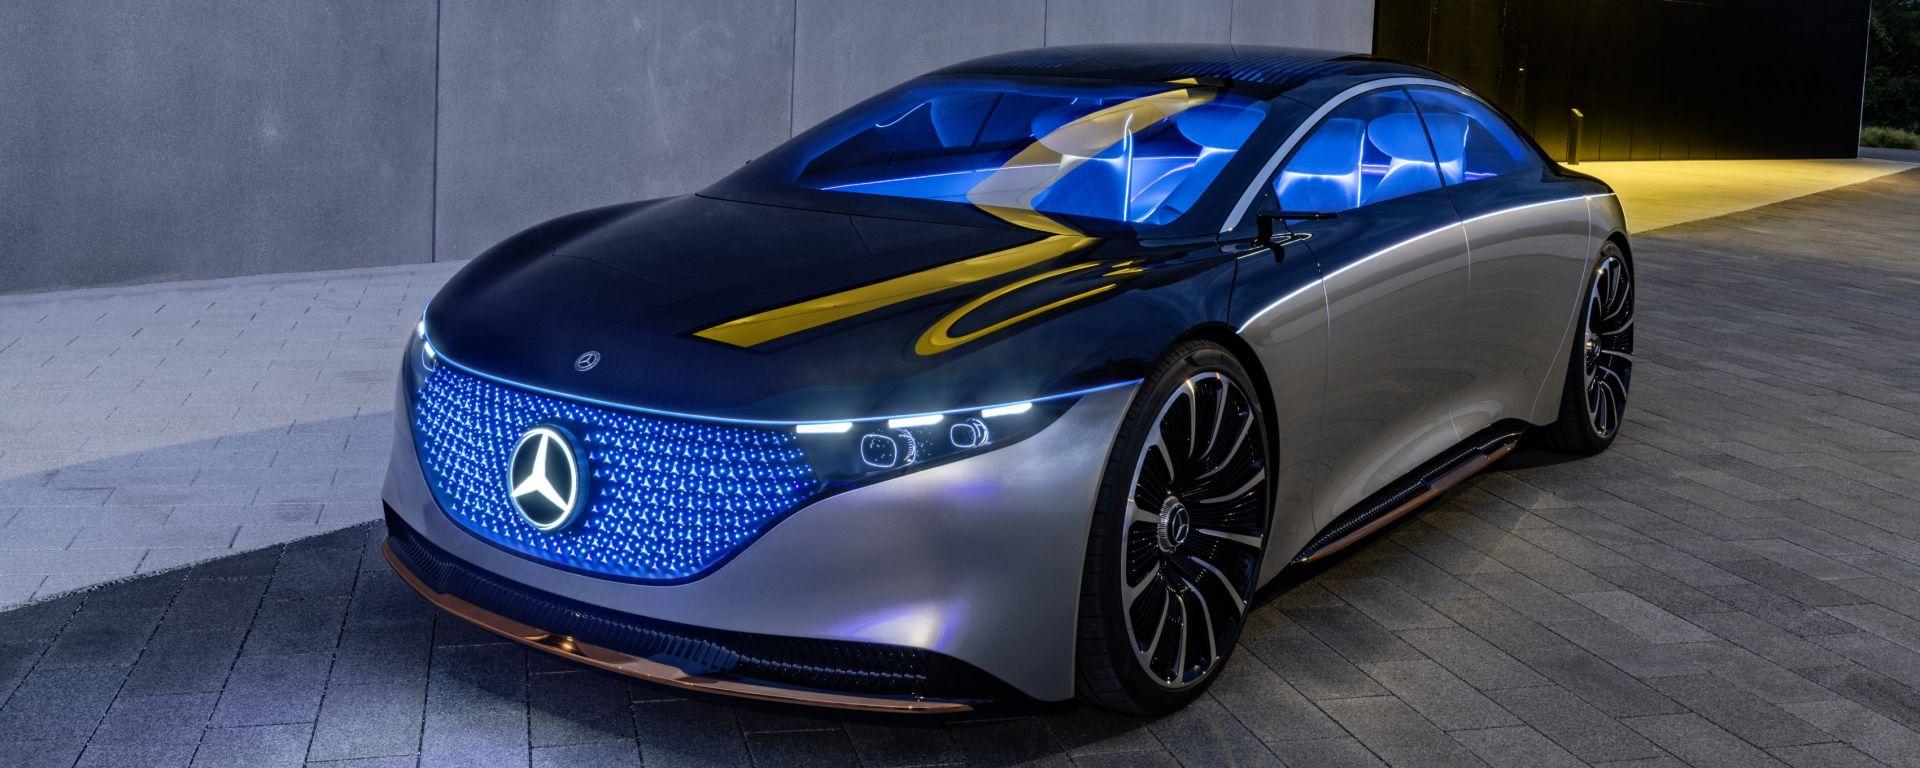 Mercedes e Nvidia per i supercomputer di domani